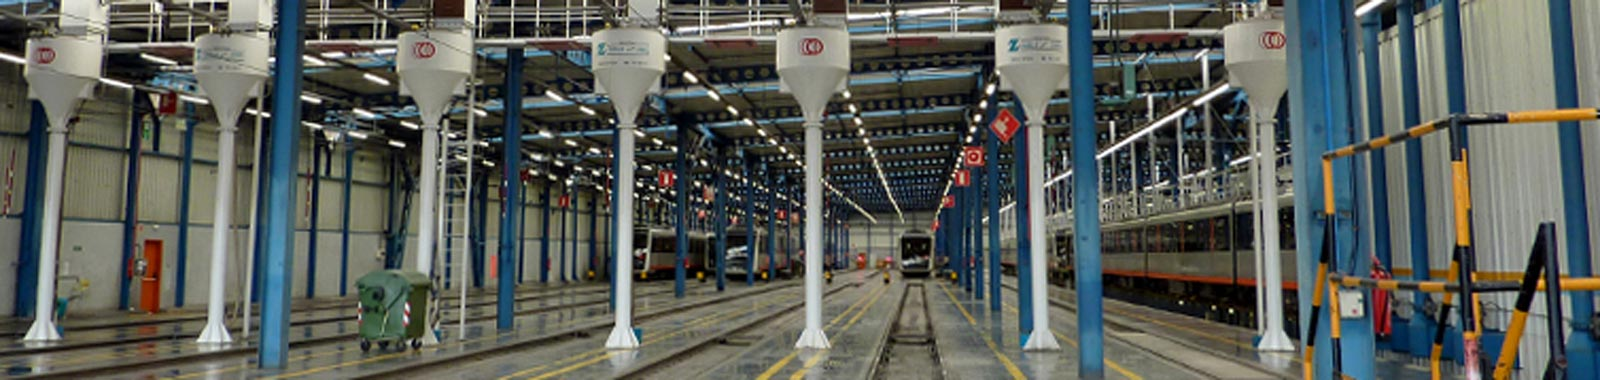 Inside a railway facility